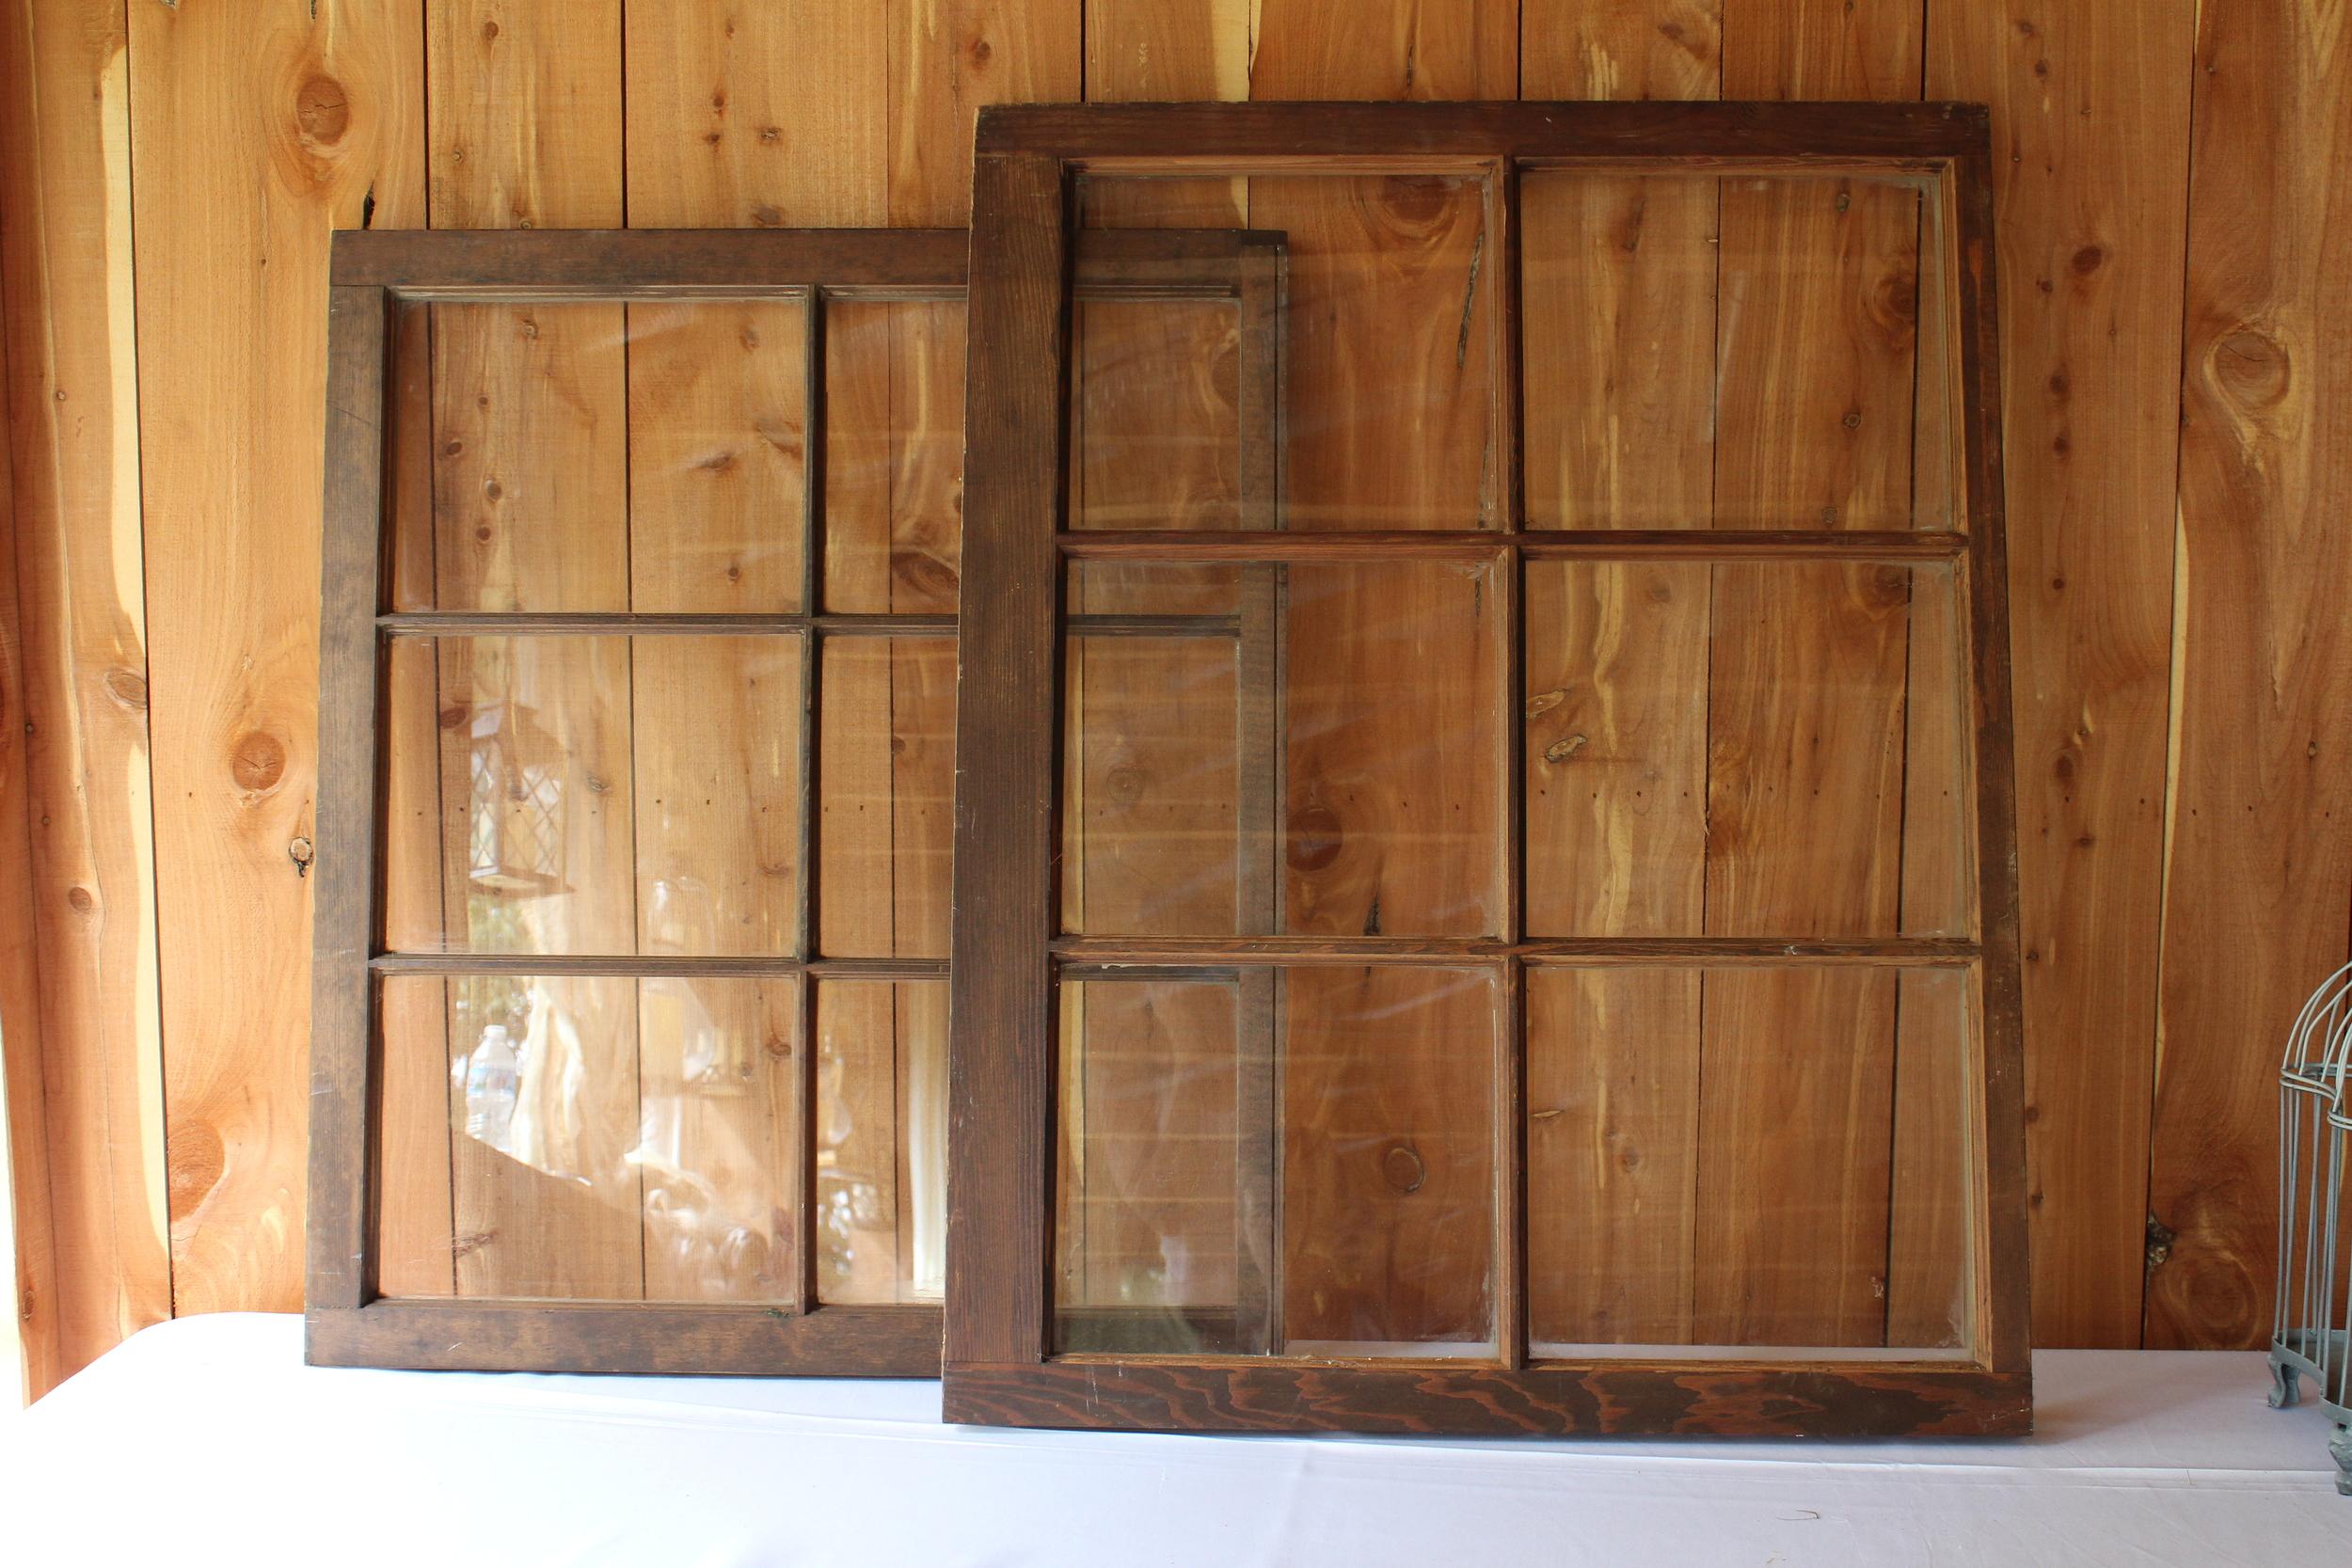 #141 - Brown Windows (QTY 2)